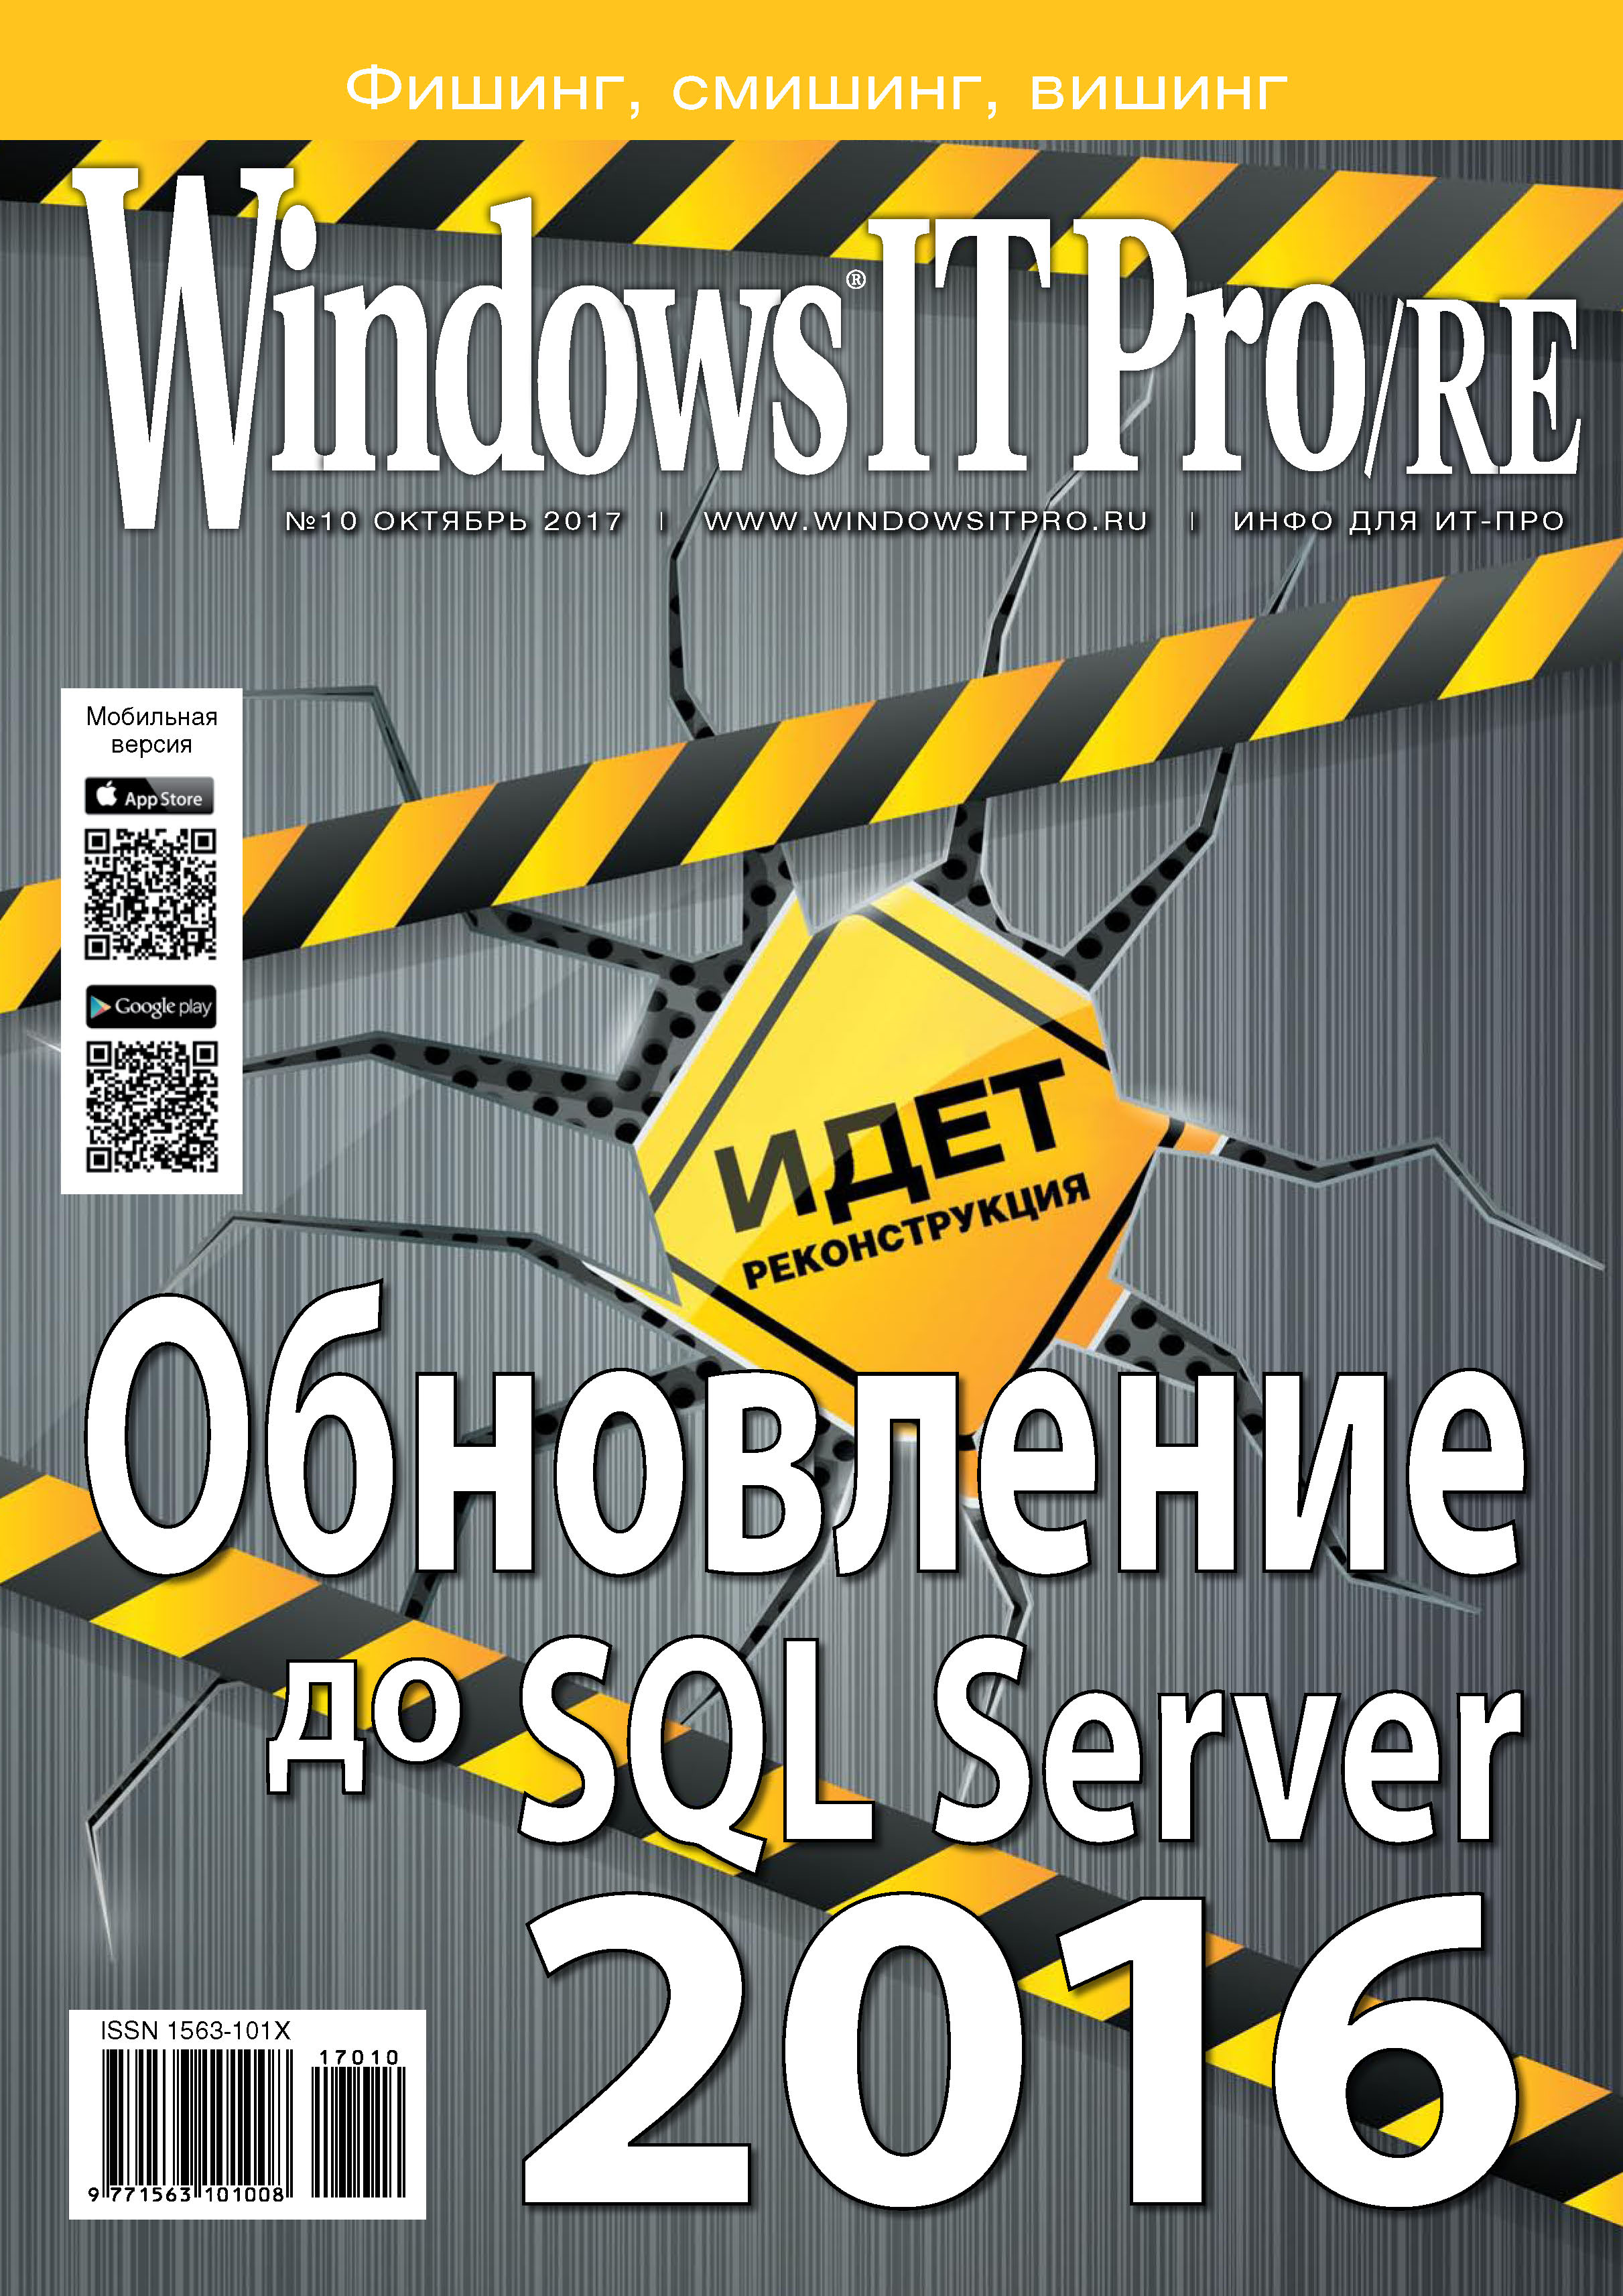 Открытые системы Windows IT Pro/RE №10/2017